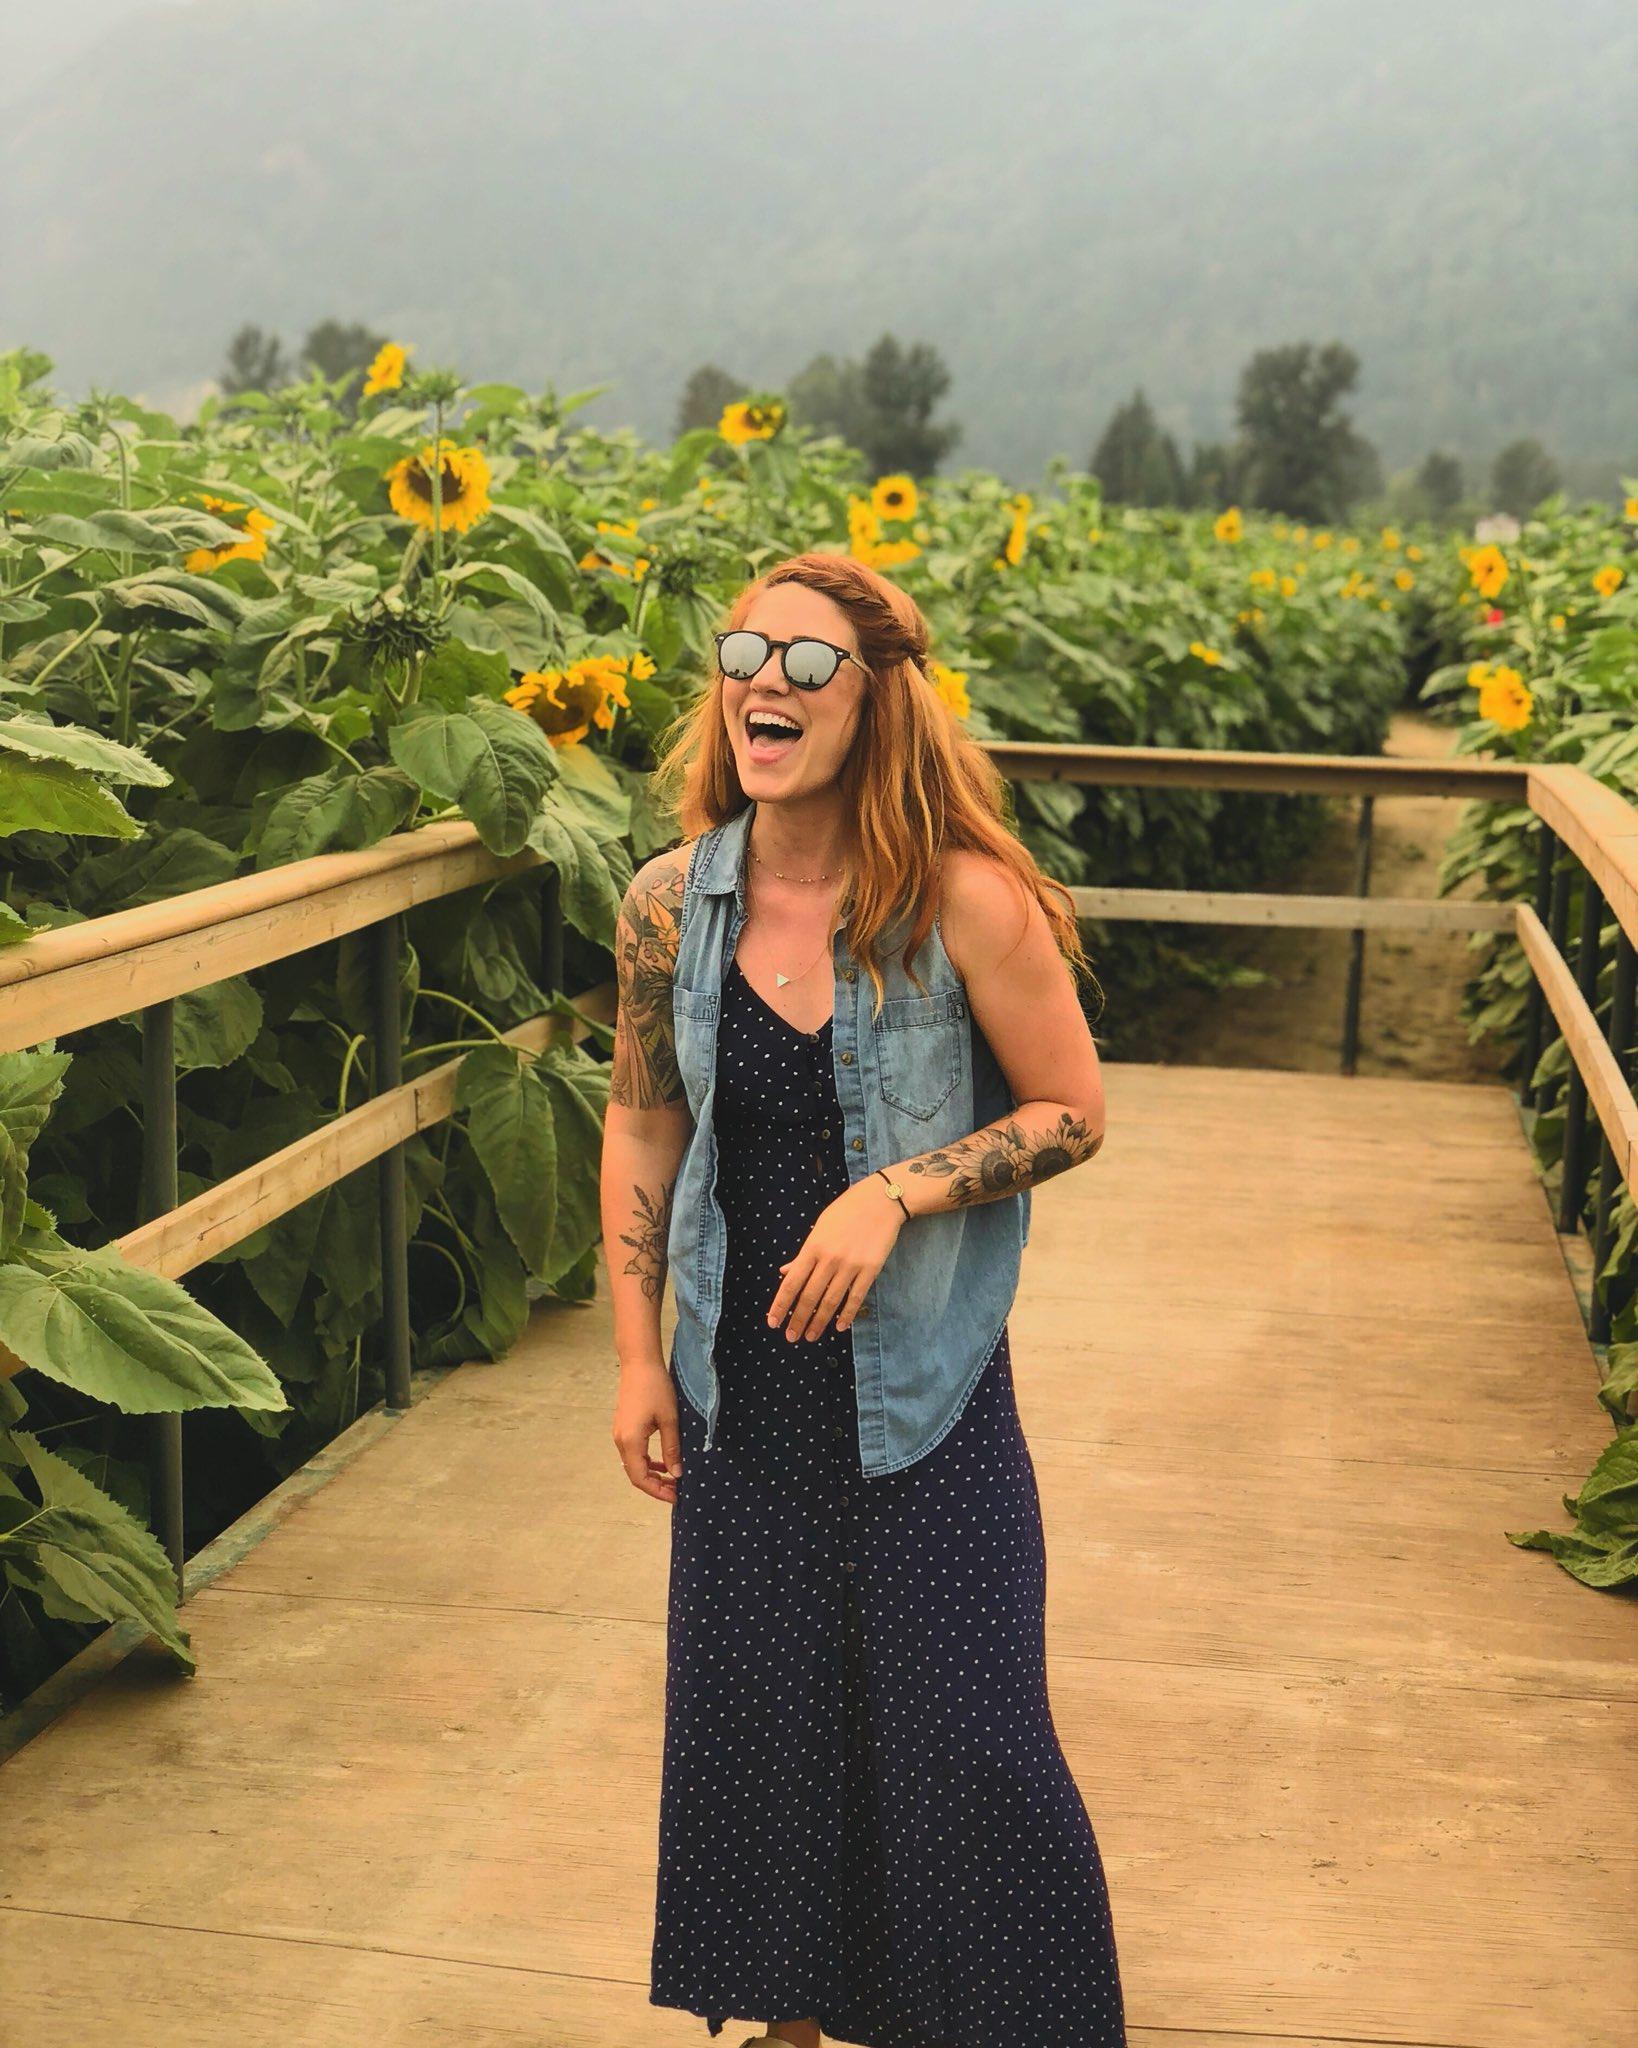 Preview: Chilliwack Sunflower Festival